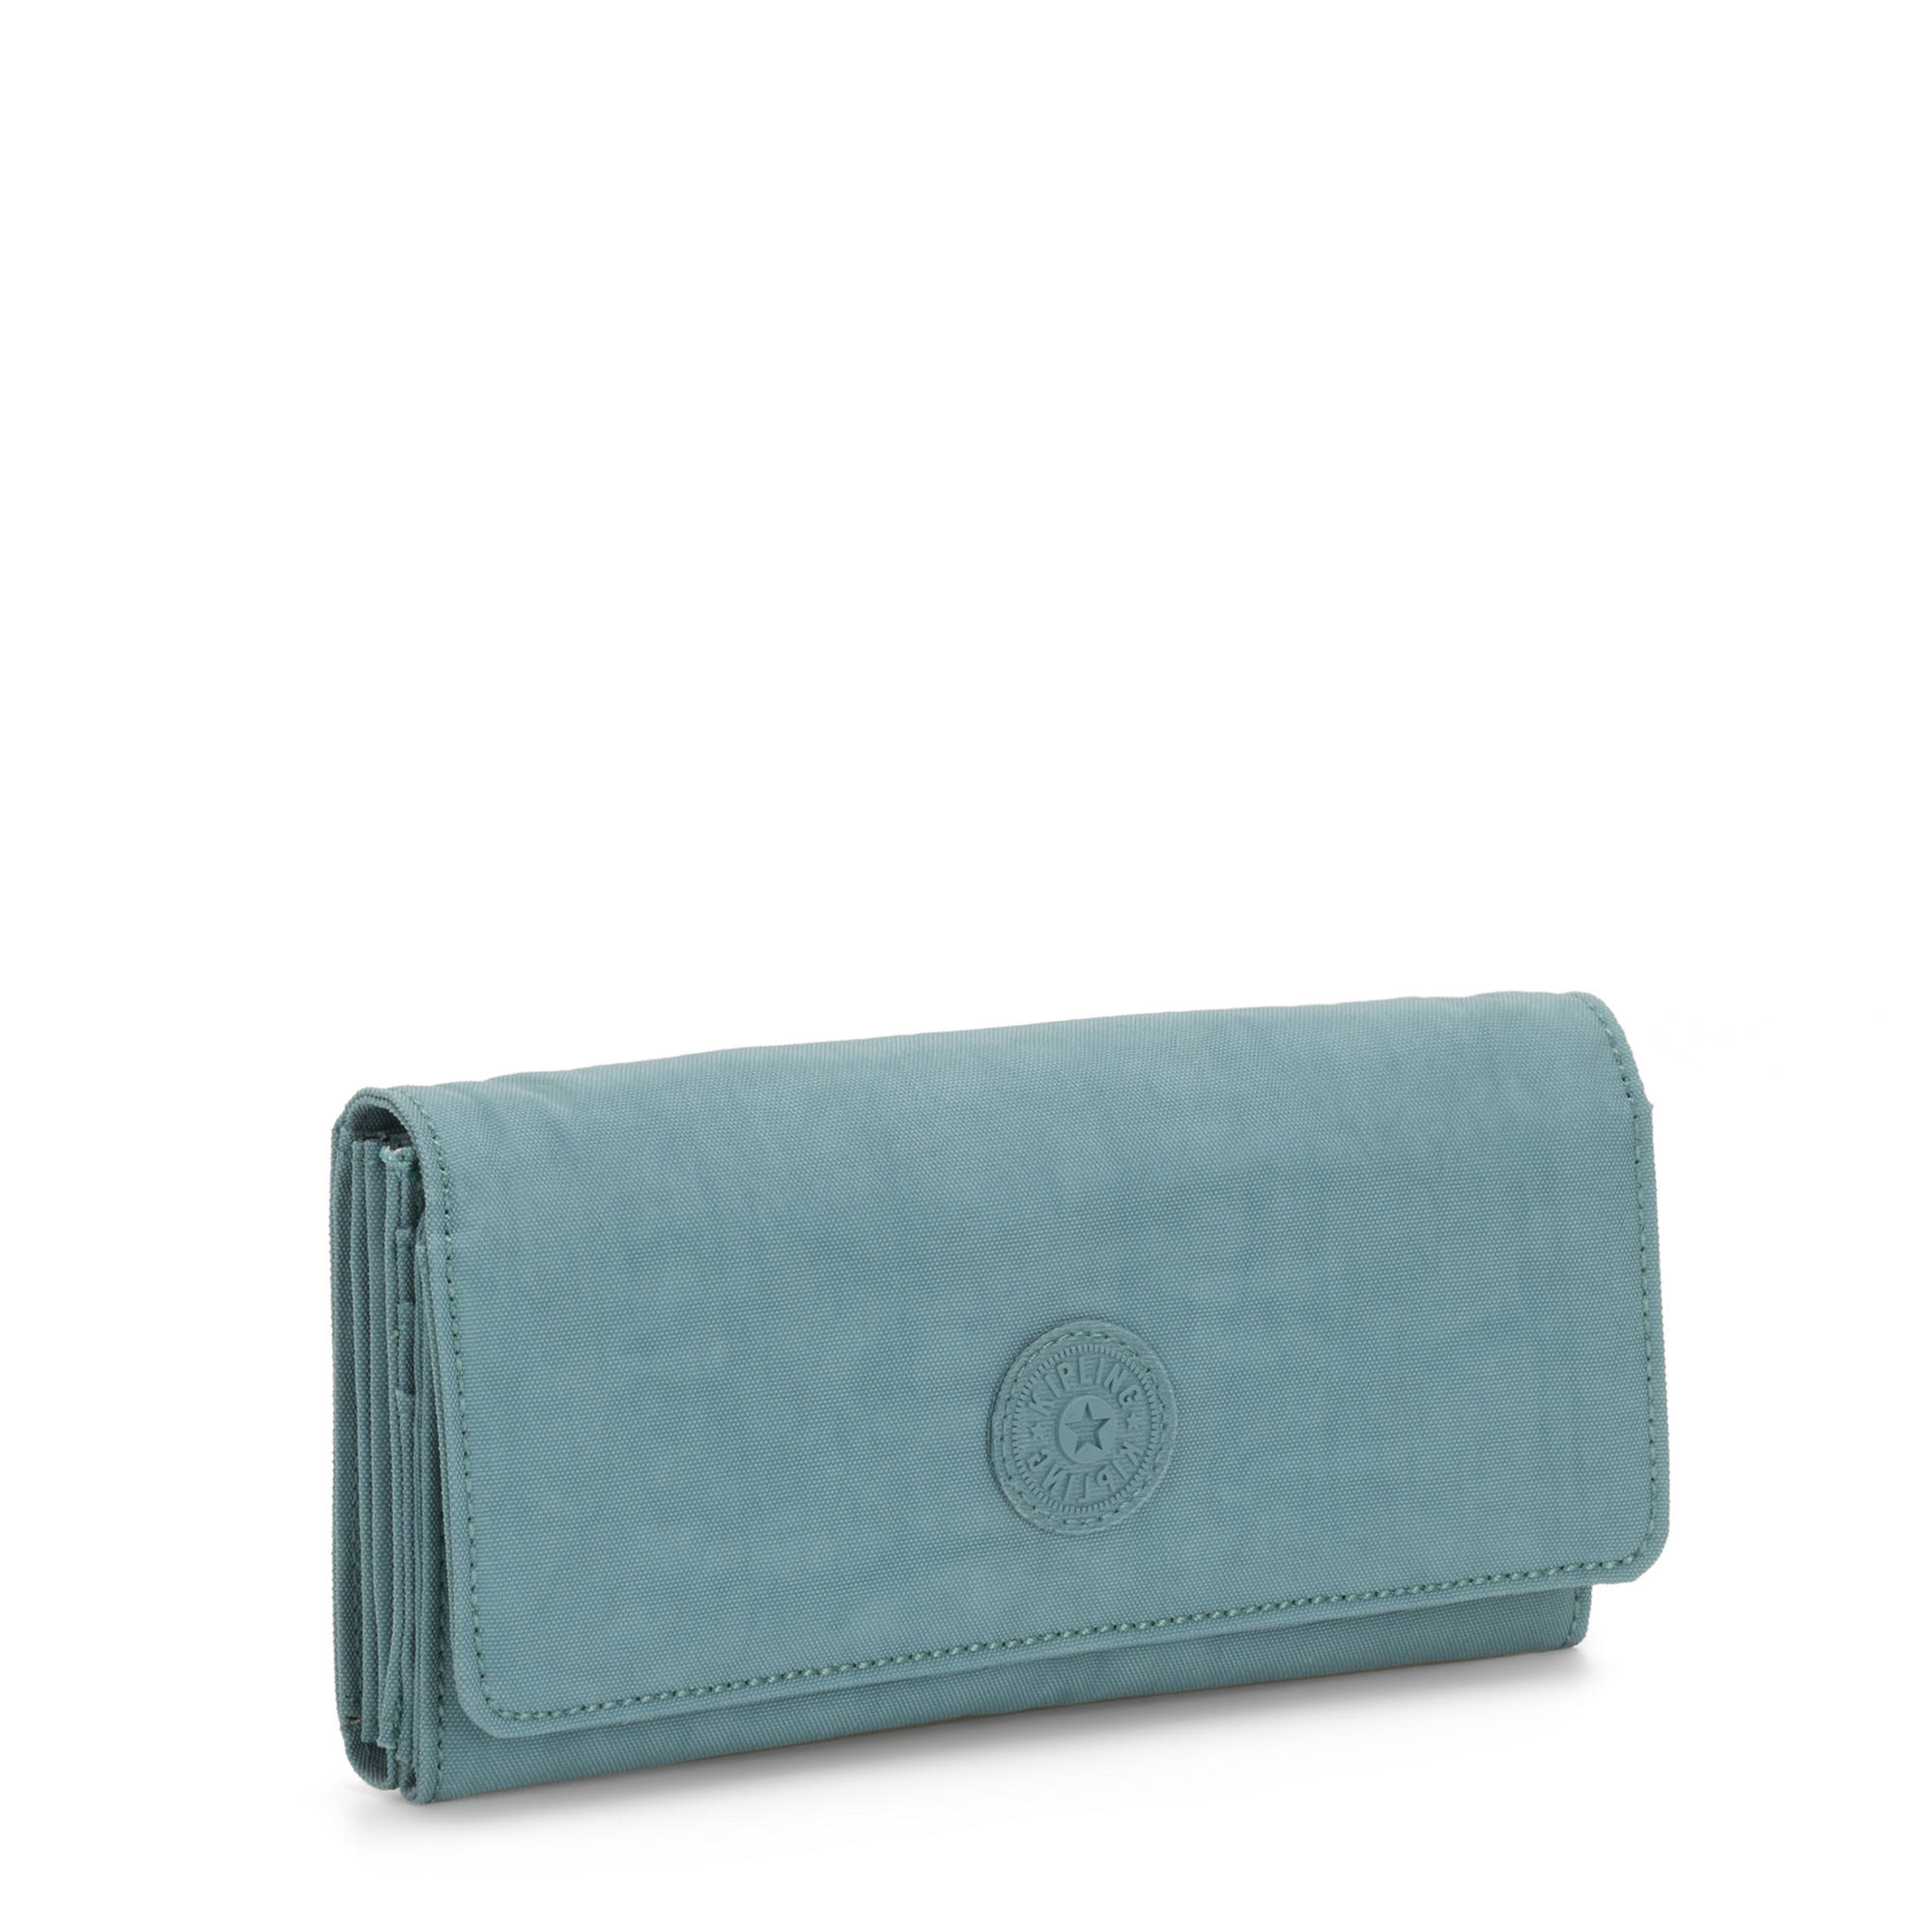 Kipling-New-Teddi-Printed-Snap-Wallet thumbnail 5